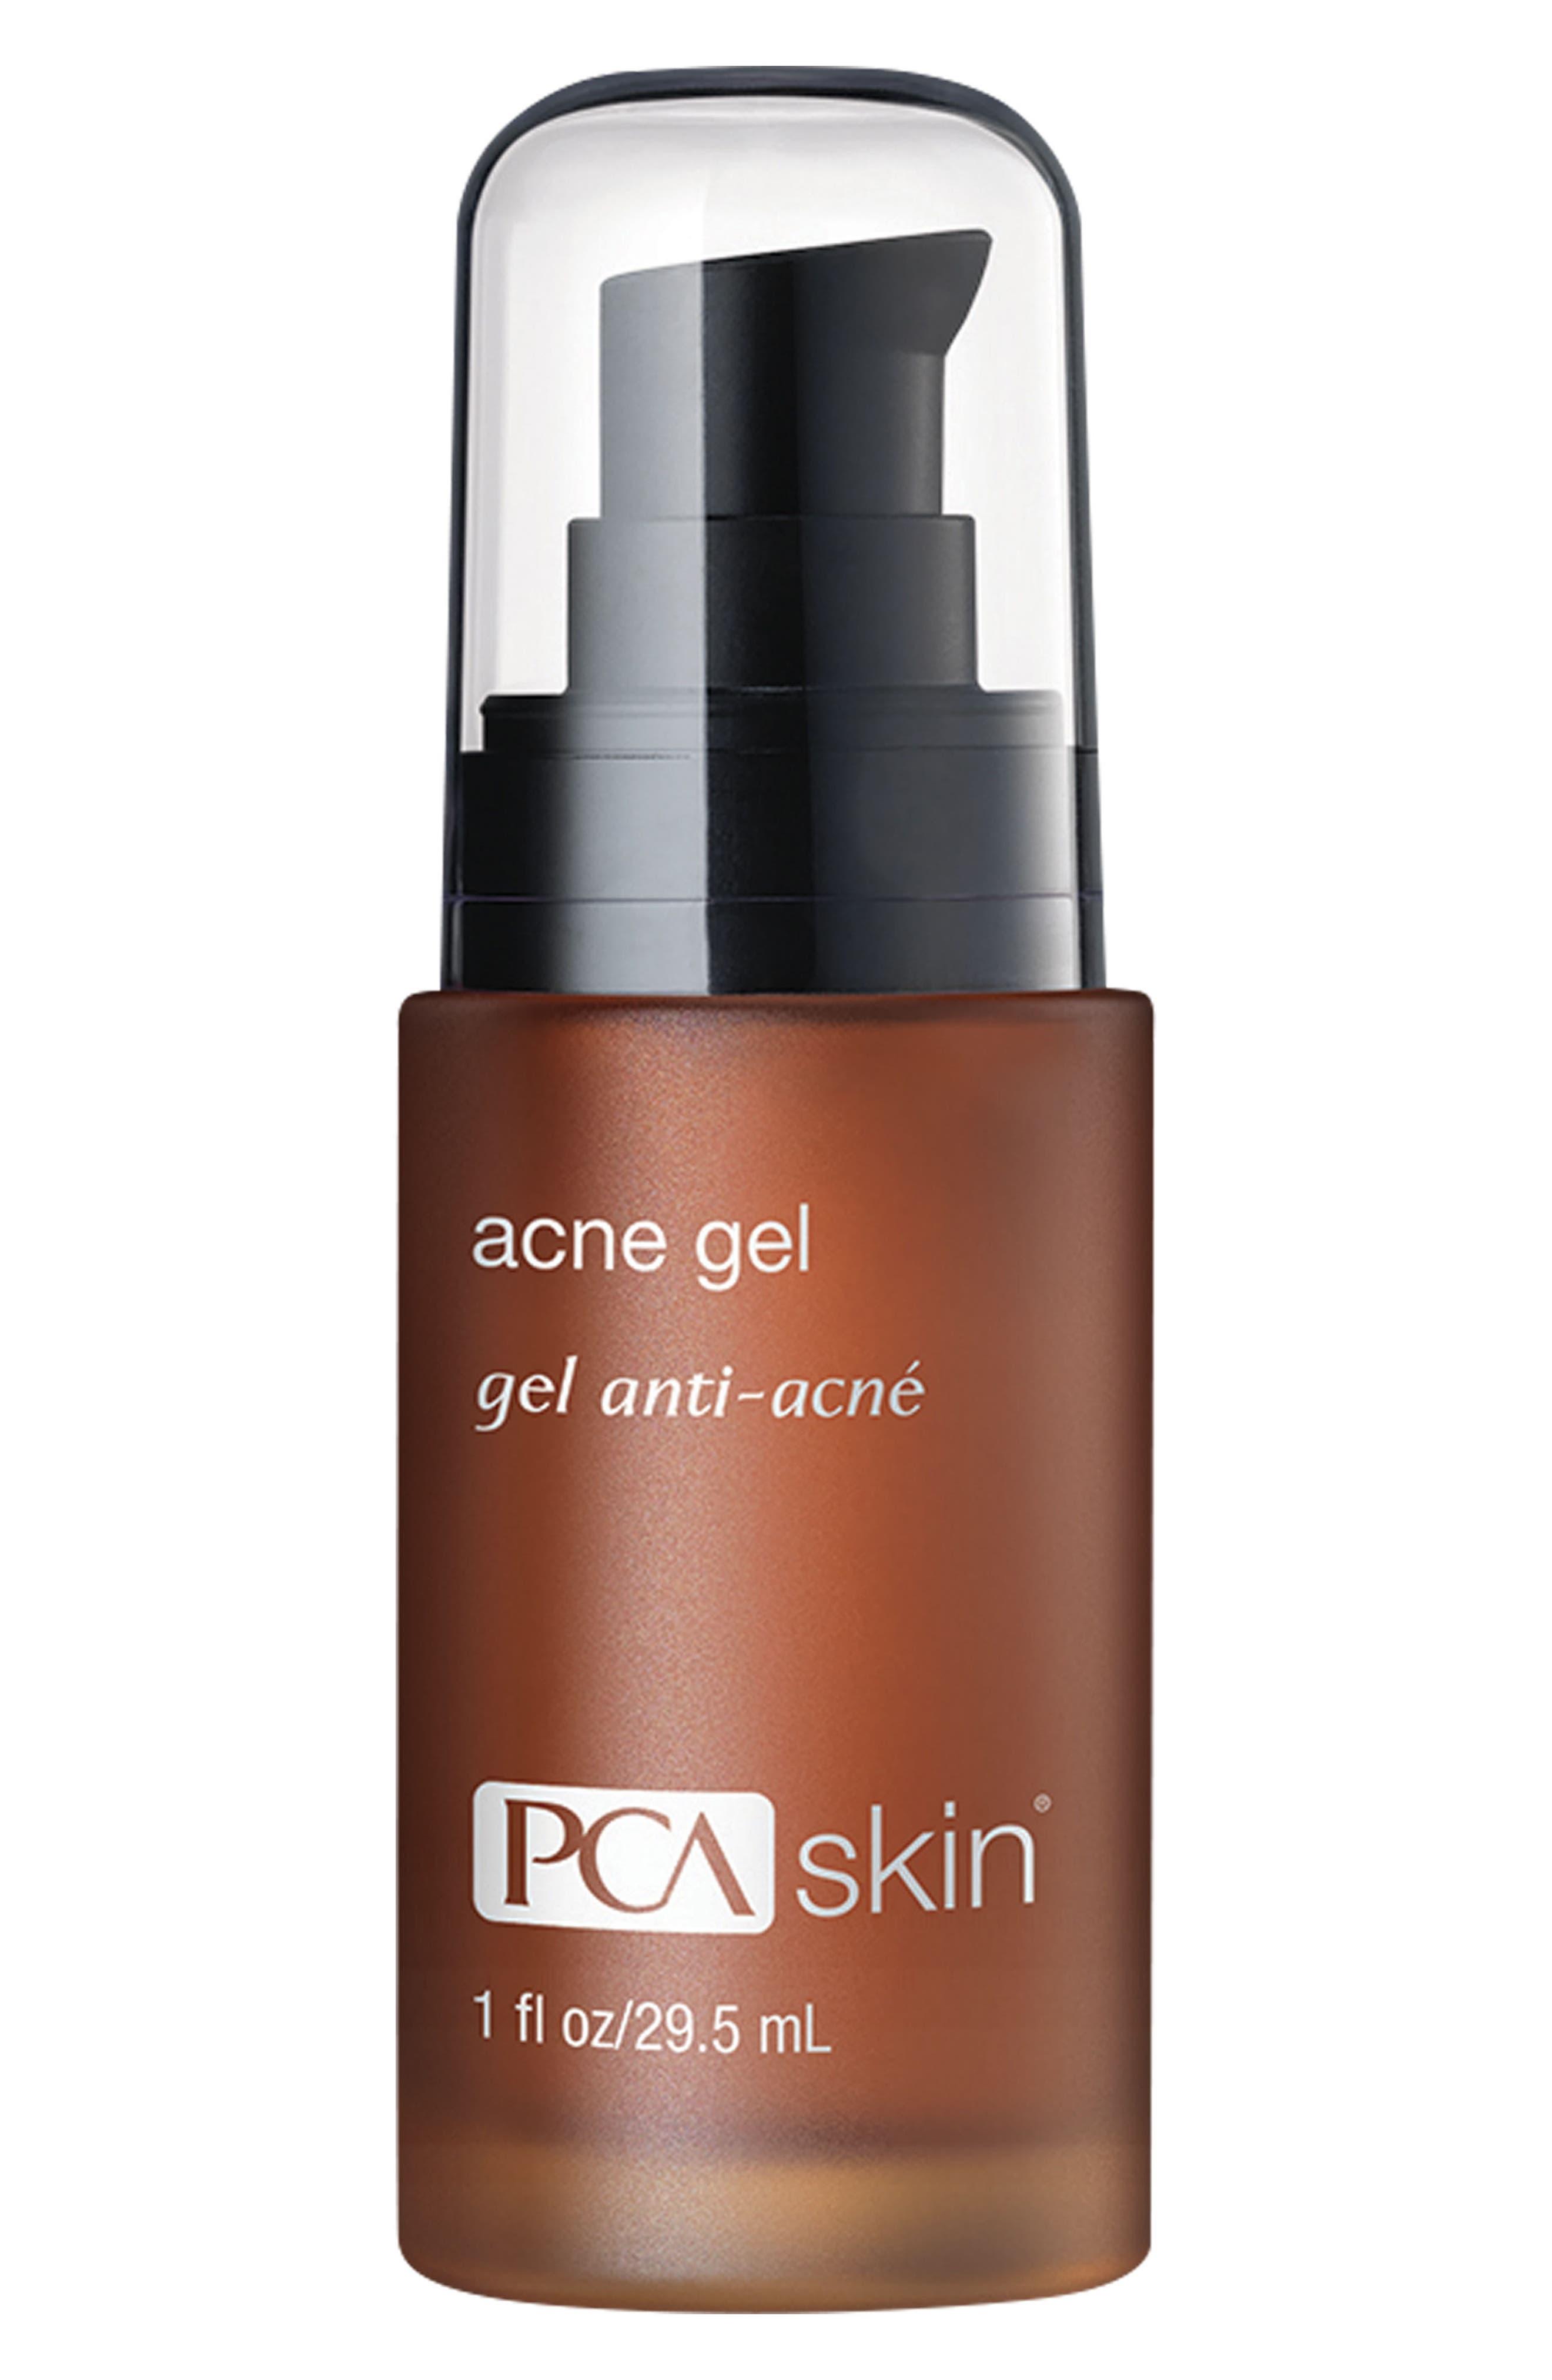 PCA SKIN Acne Gel Spot Treatment